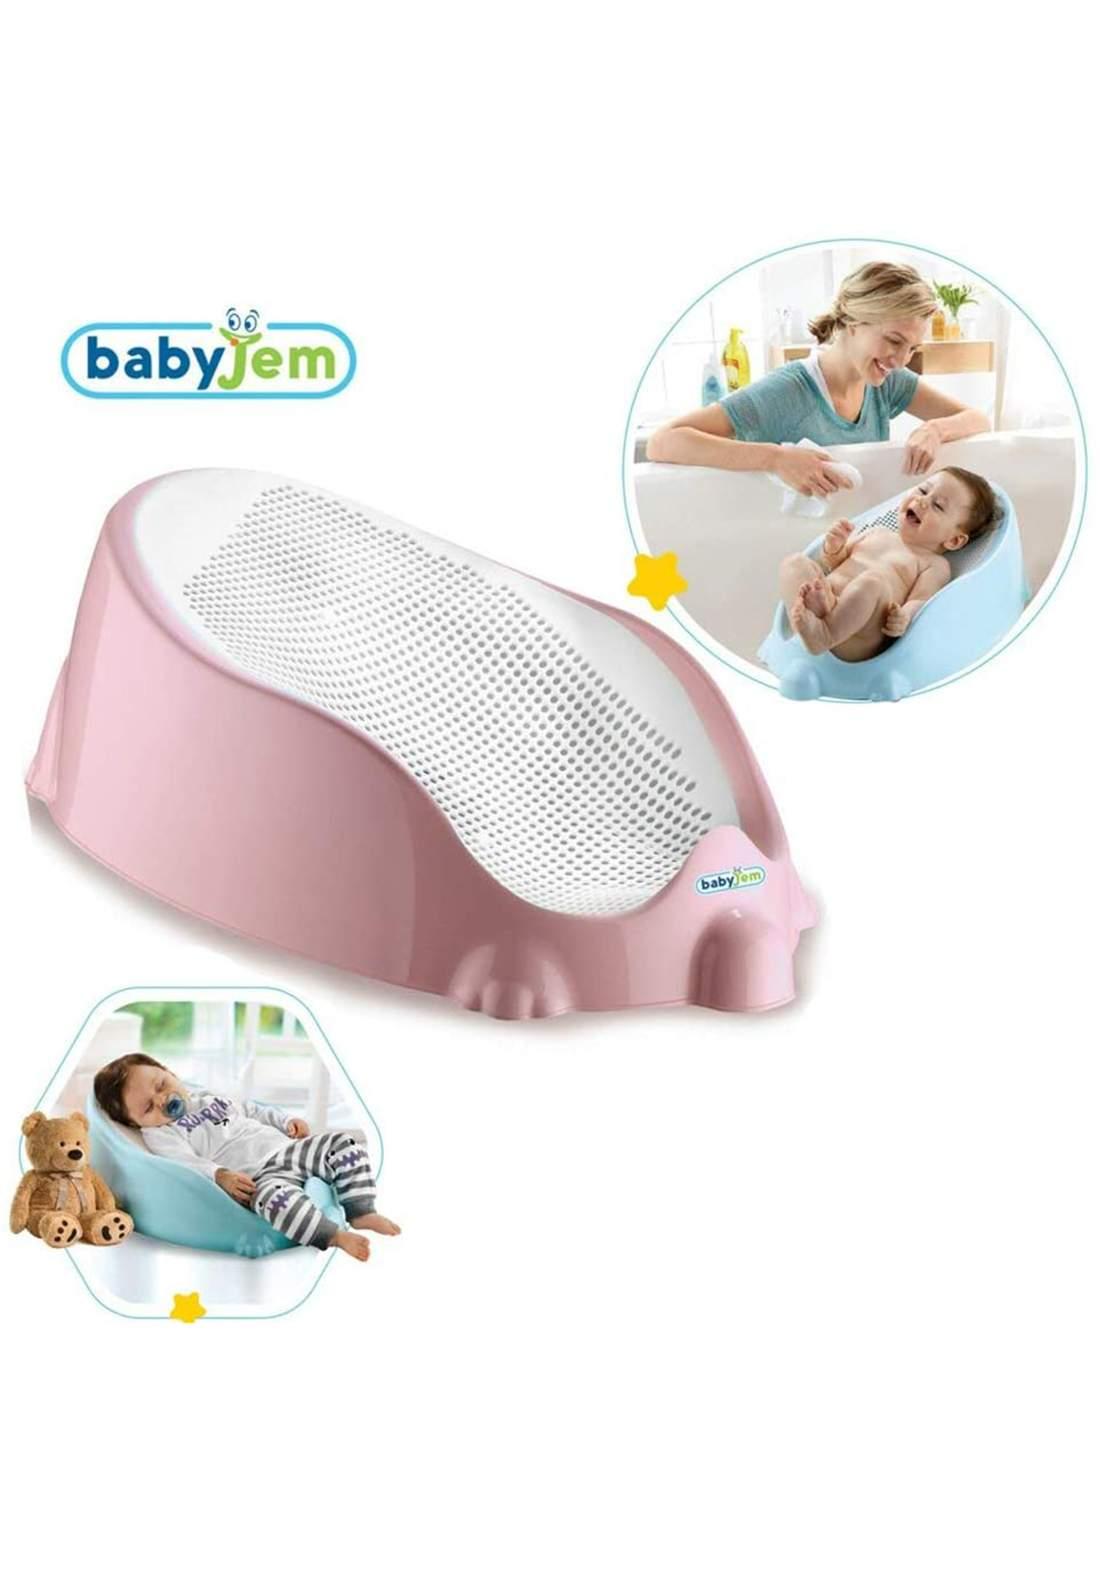 BabyJem Soft Baby Bath Support  (ART-465) Pink كرسي الاستحمام الاطفال